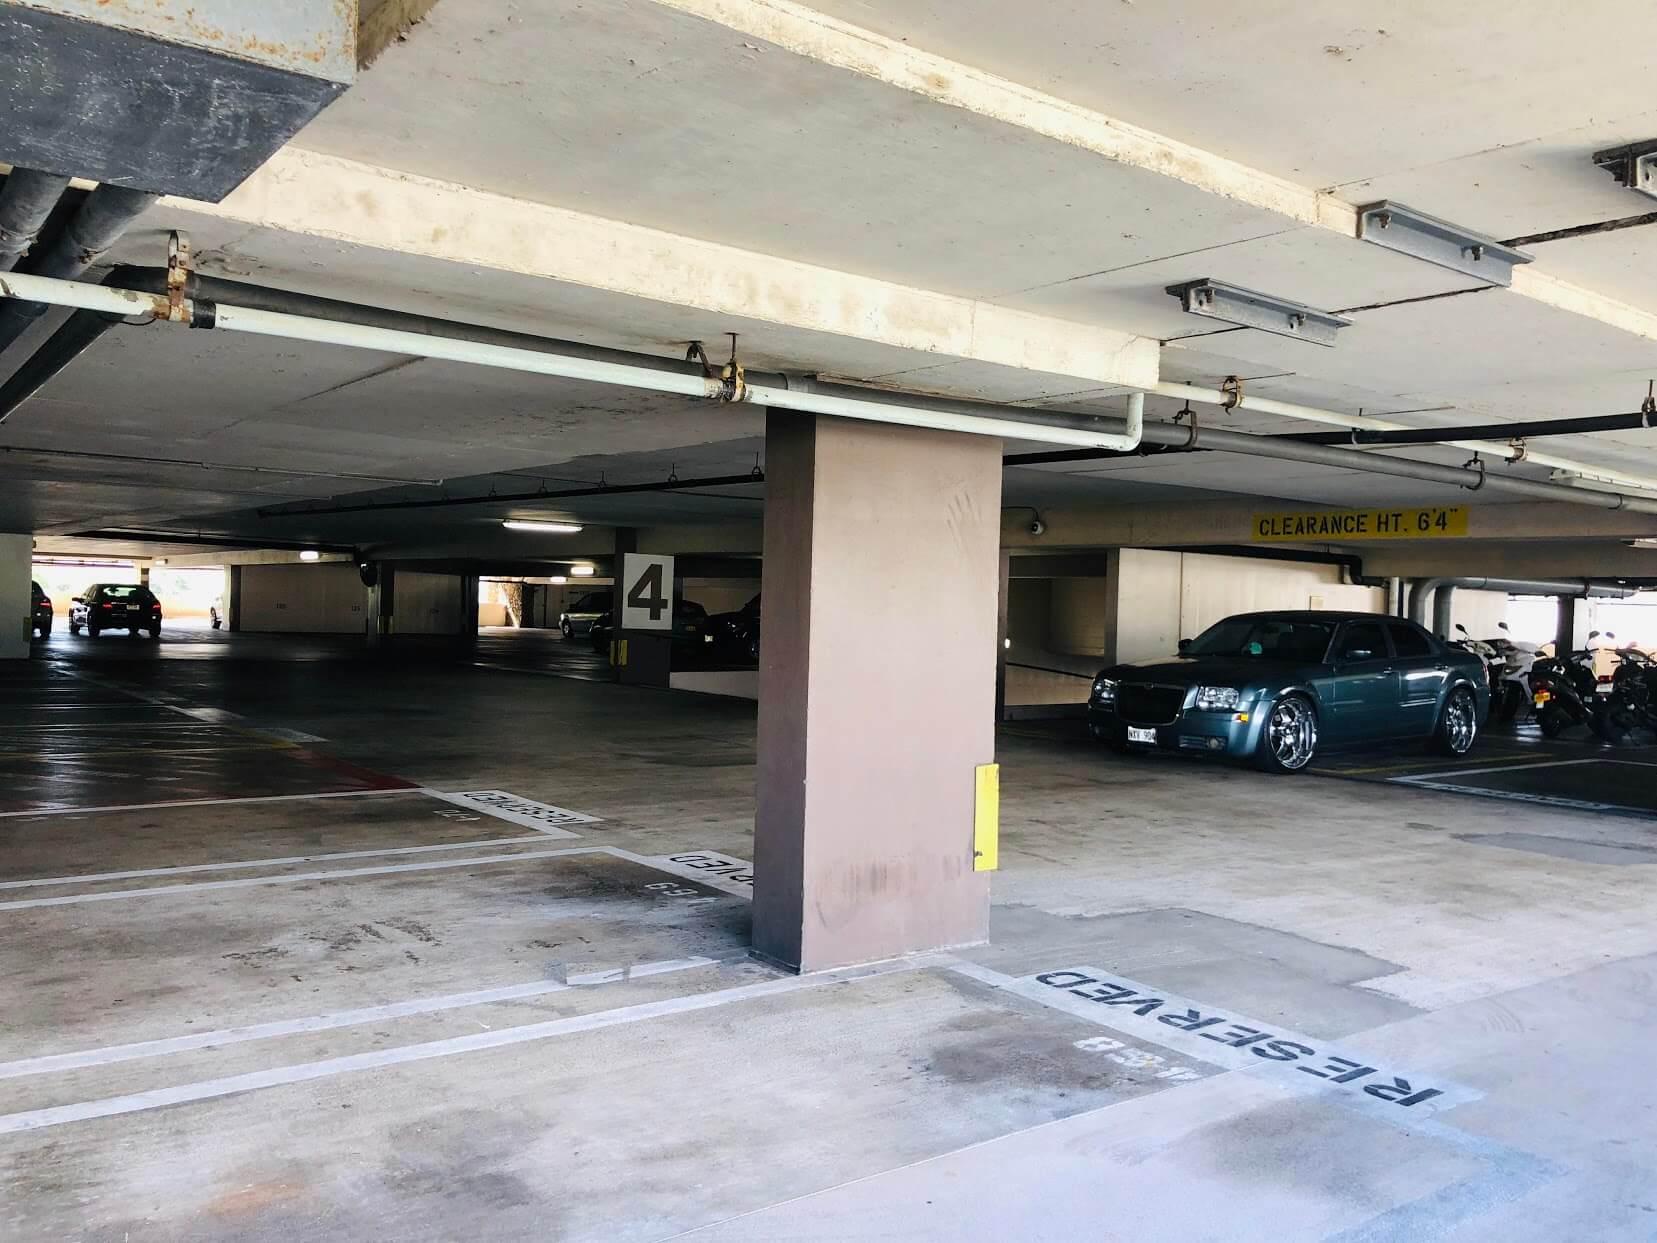 Century Centerの駐車場